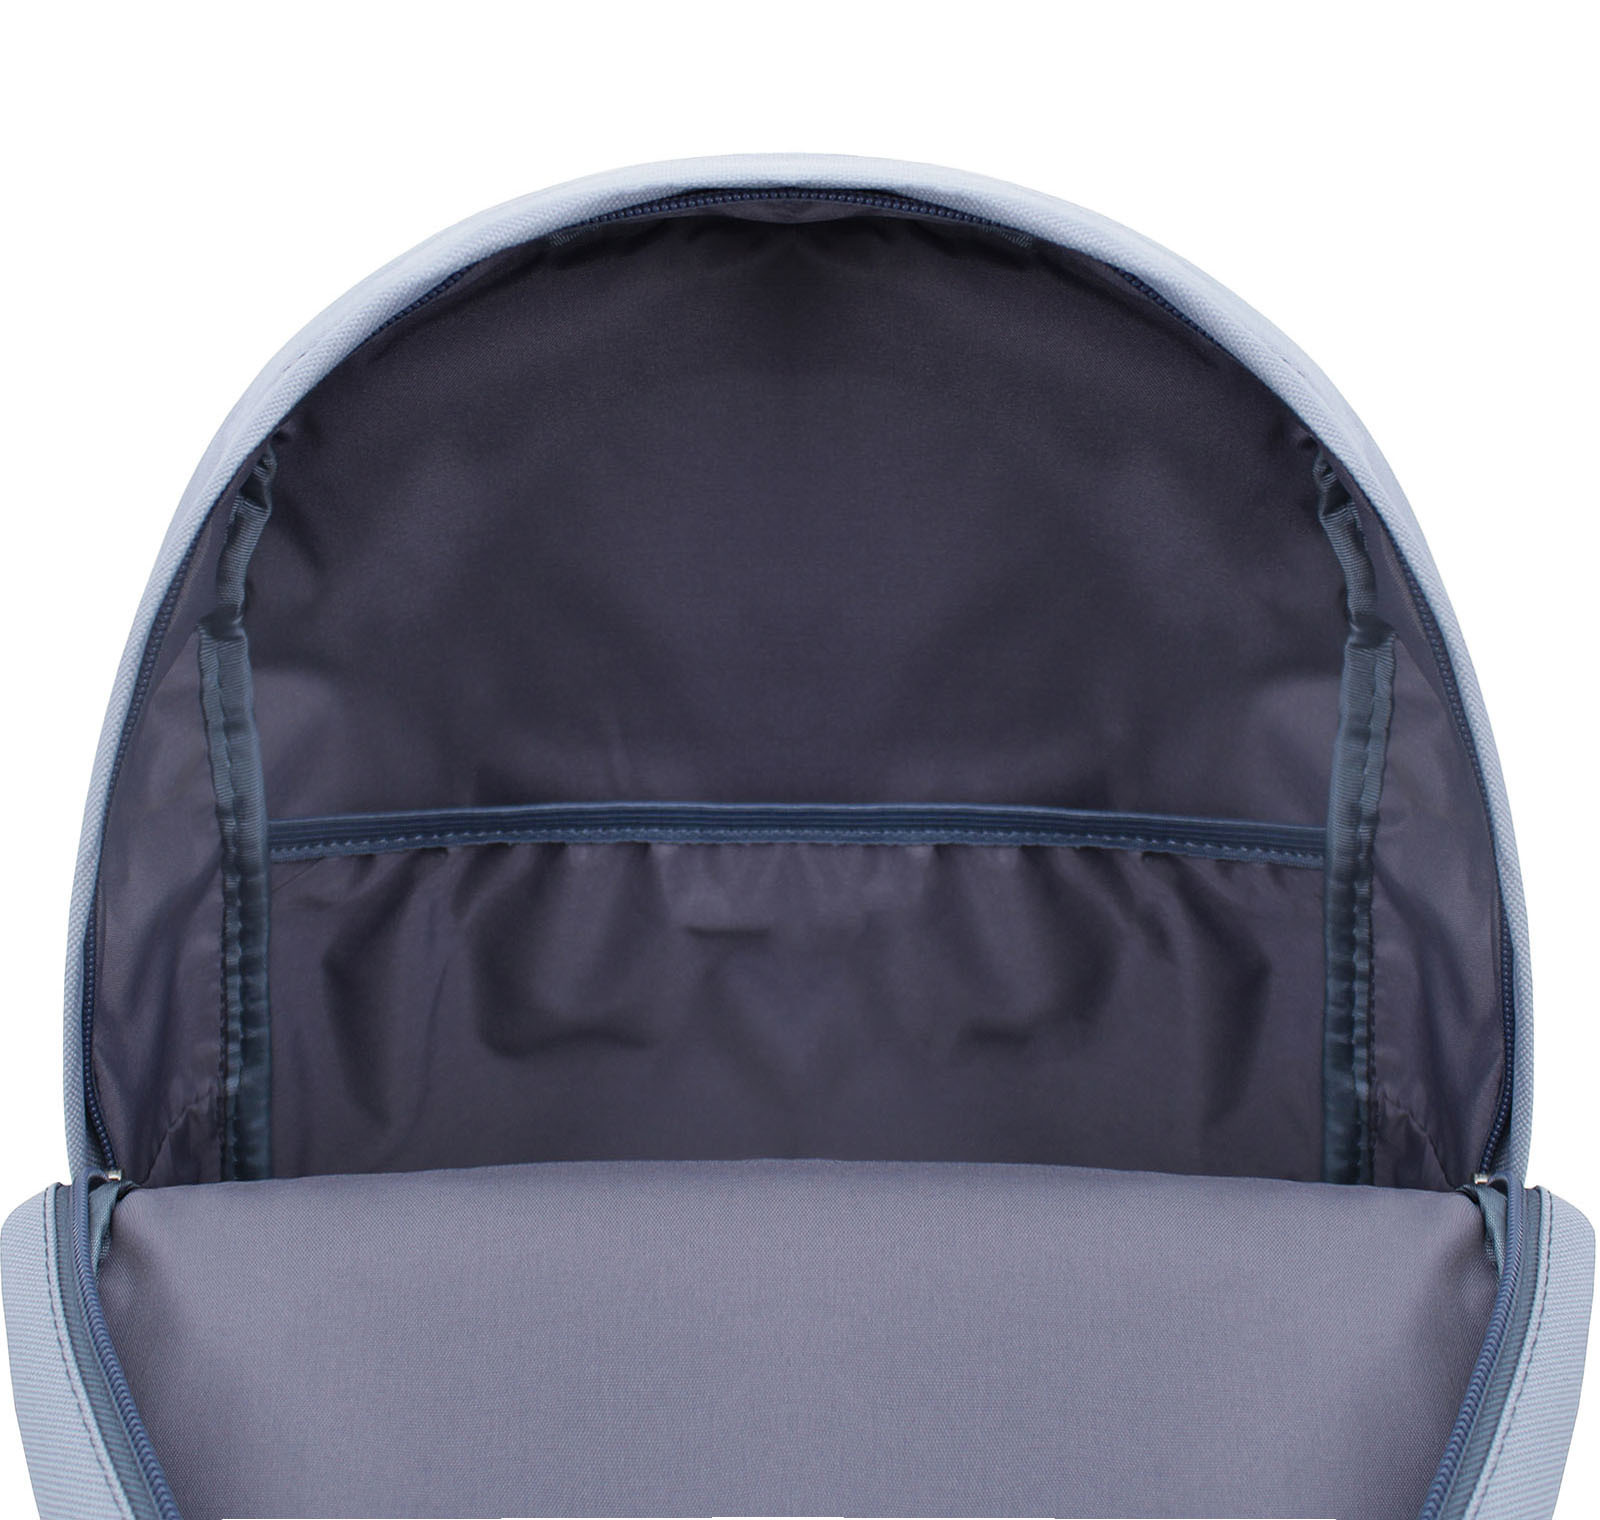 Рюкзак Bagland Молодежный W/R 17 л. серый/розовый (00533662) фото 4